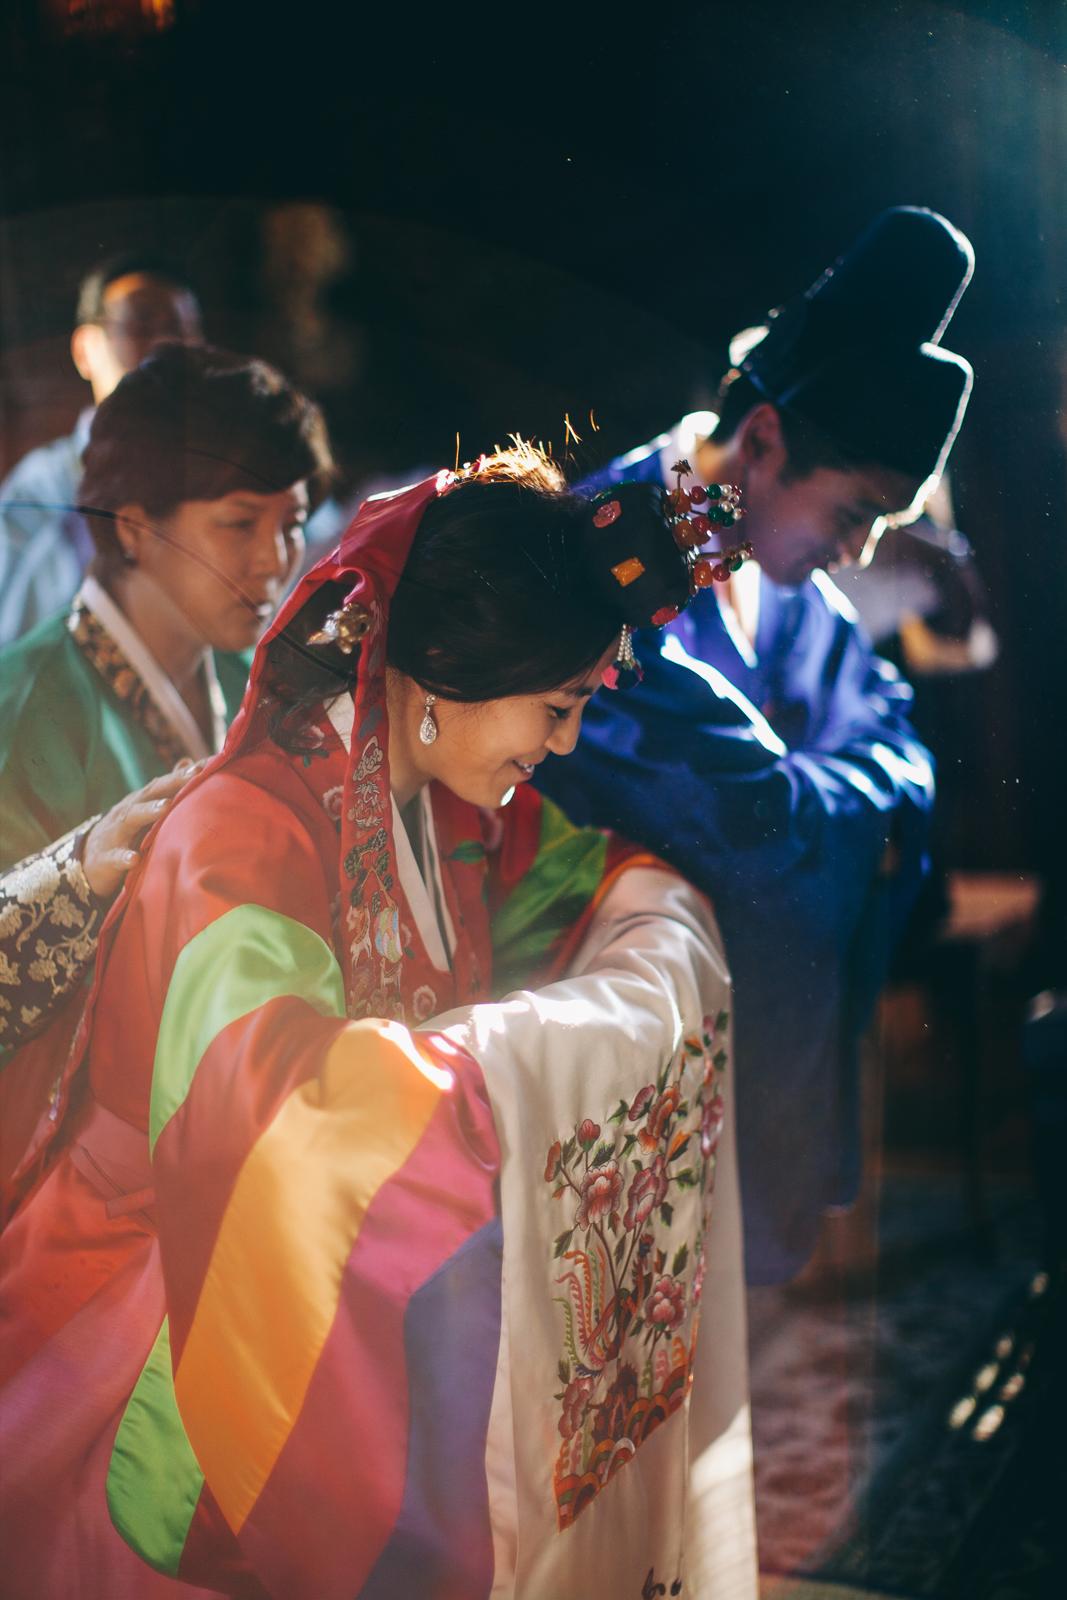 kohl_manison_wedding_photography_sarah_eric_ebony_siovhan_bokeh_photography_056.jpg